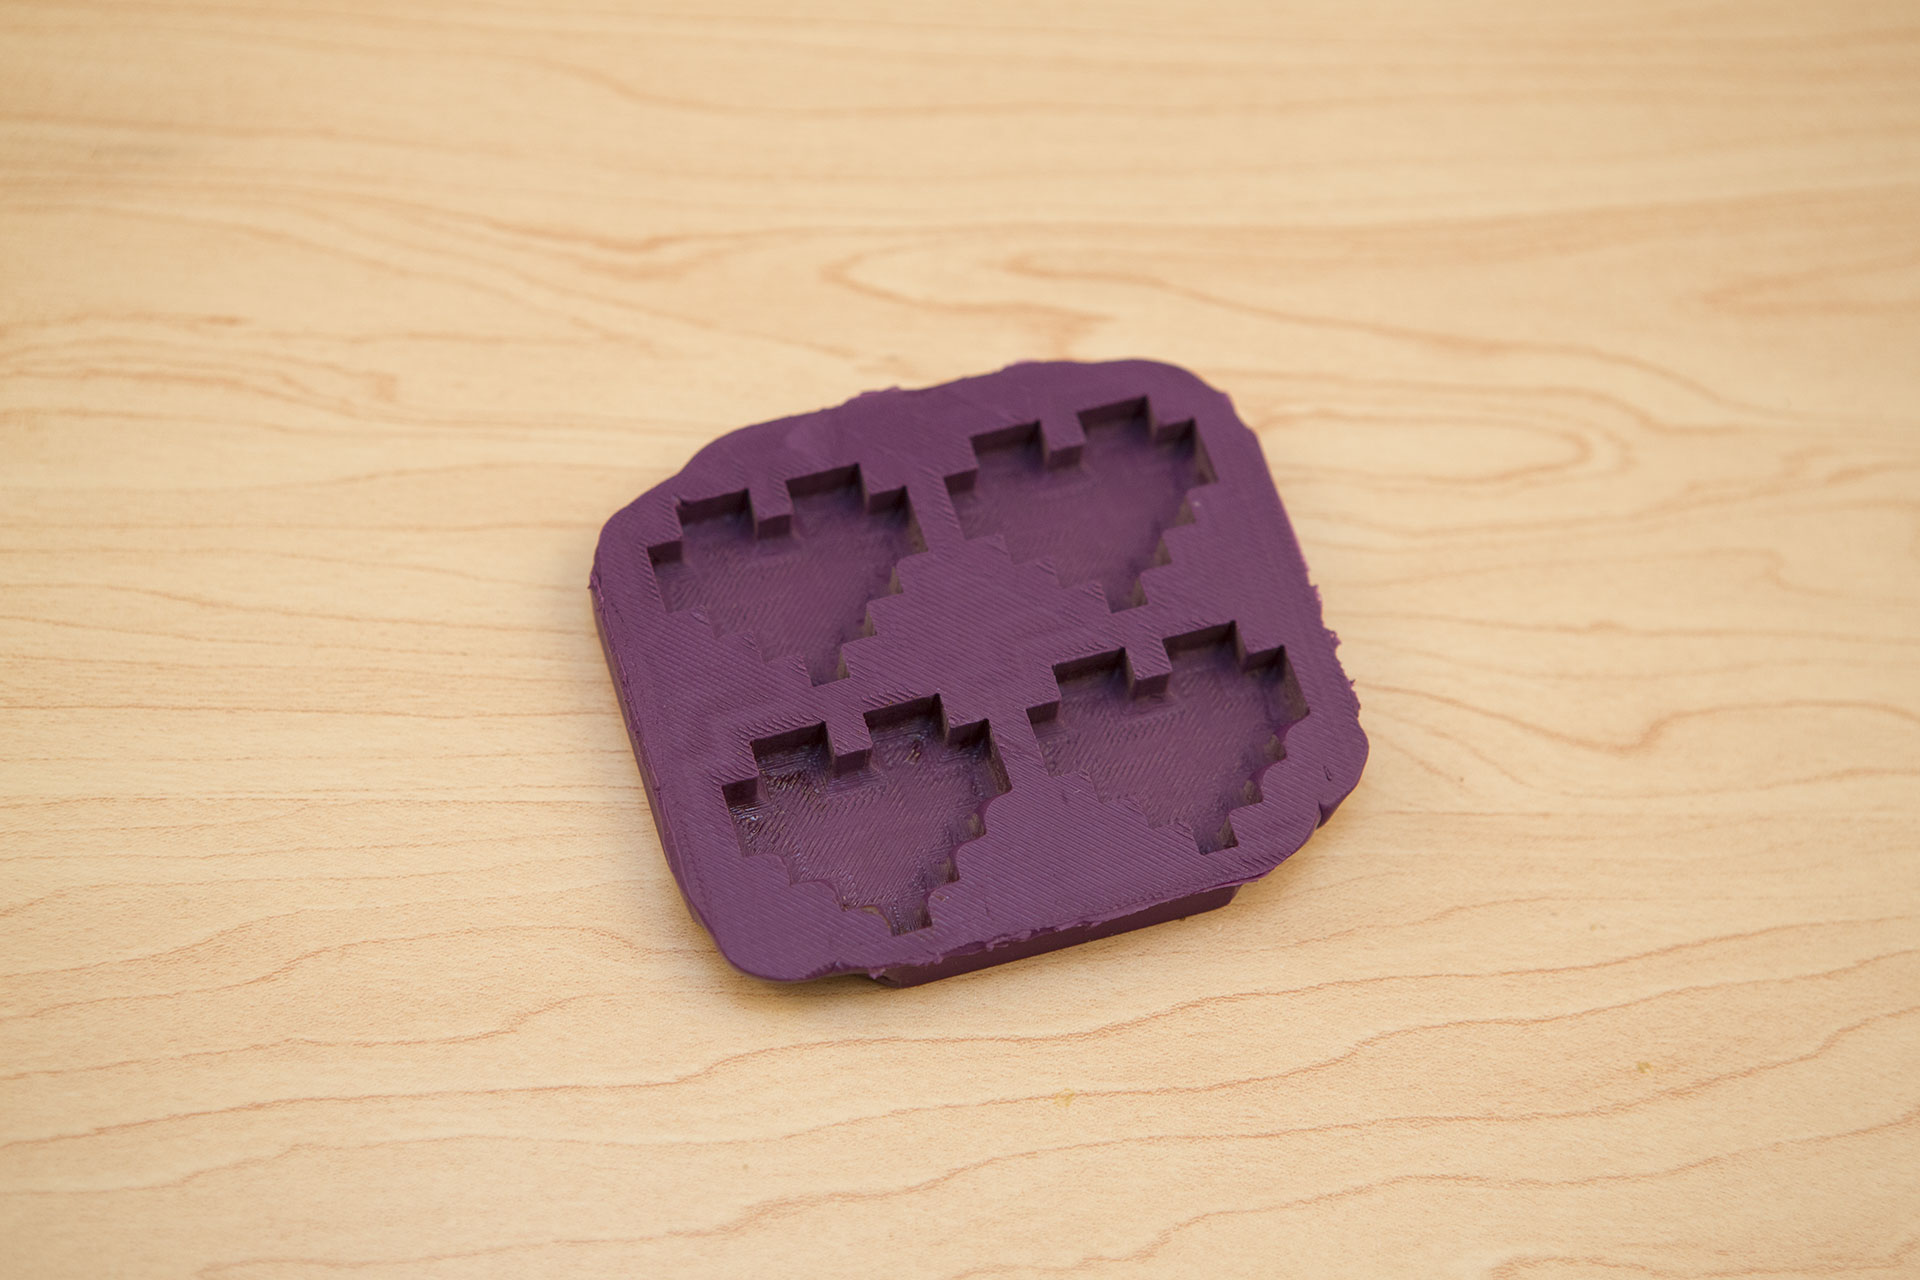 3d_printing_heart-mold.jpg